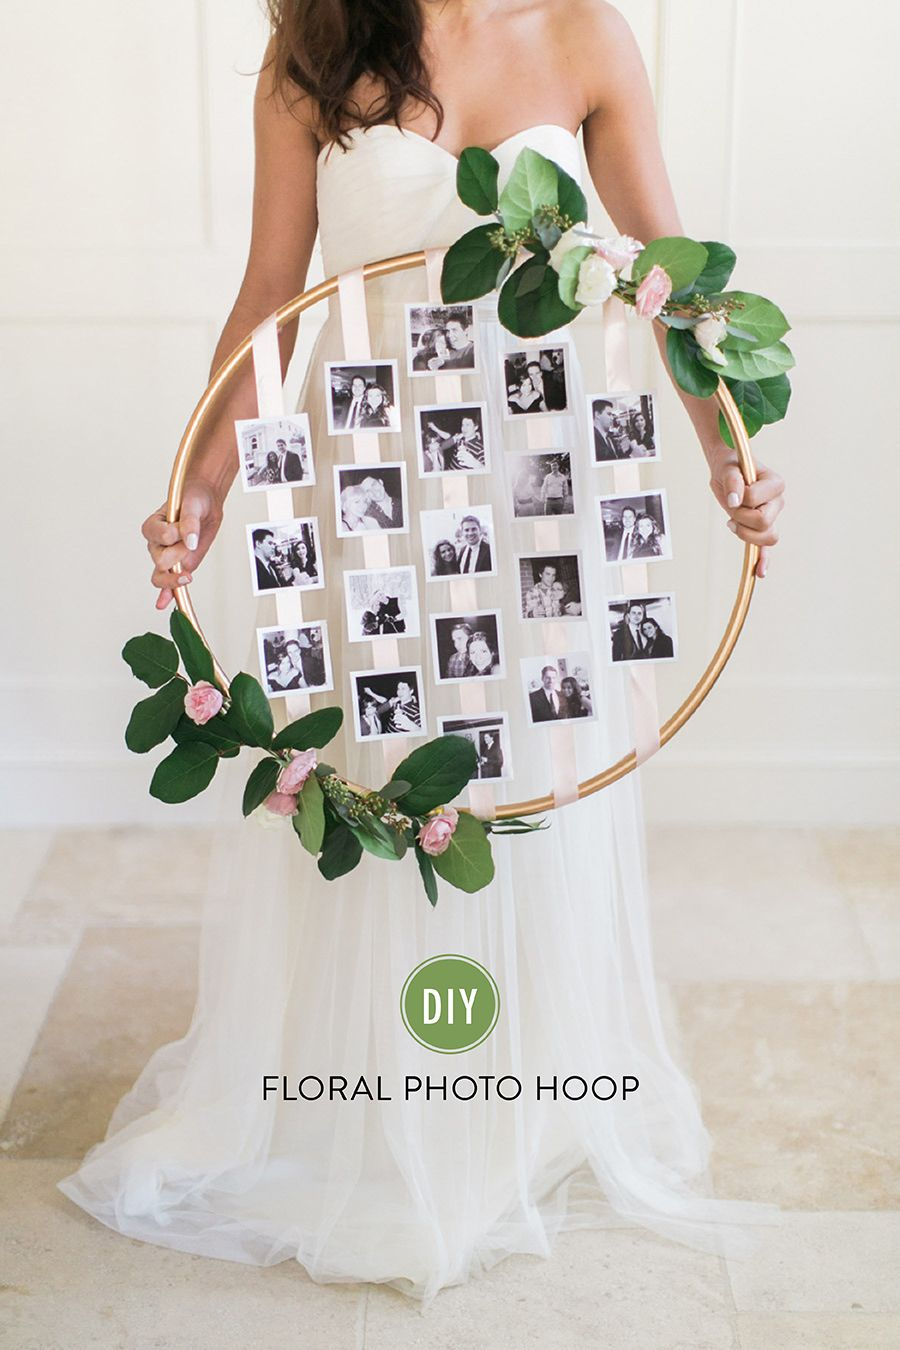 DIY Floral Photo Hoop   Wedding photo display, Diy wedding decorations, Diy  wedding